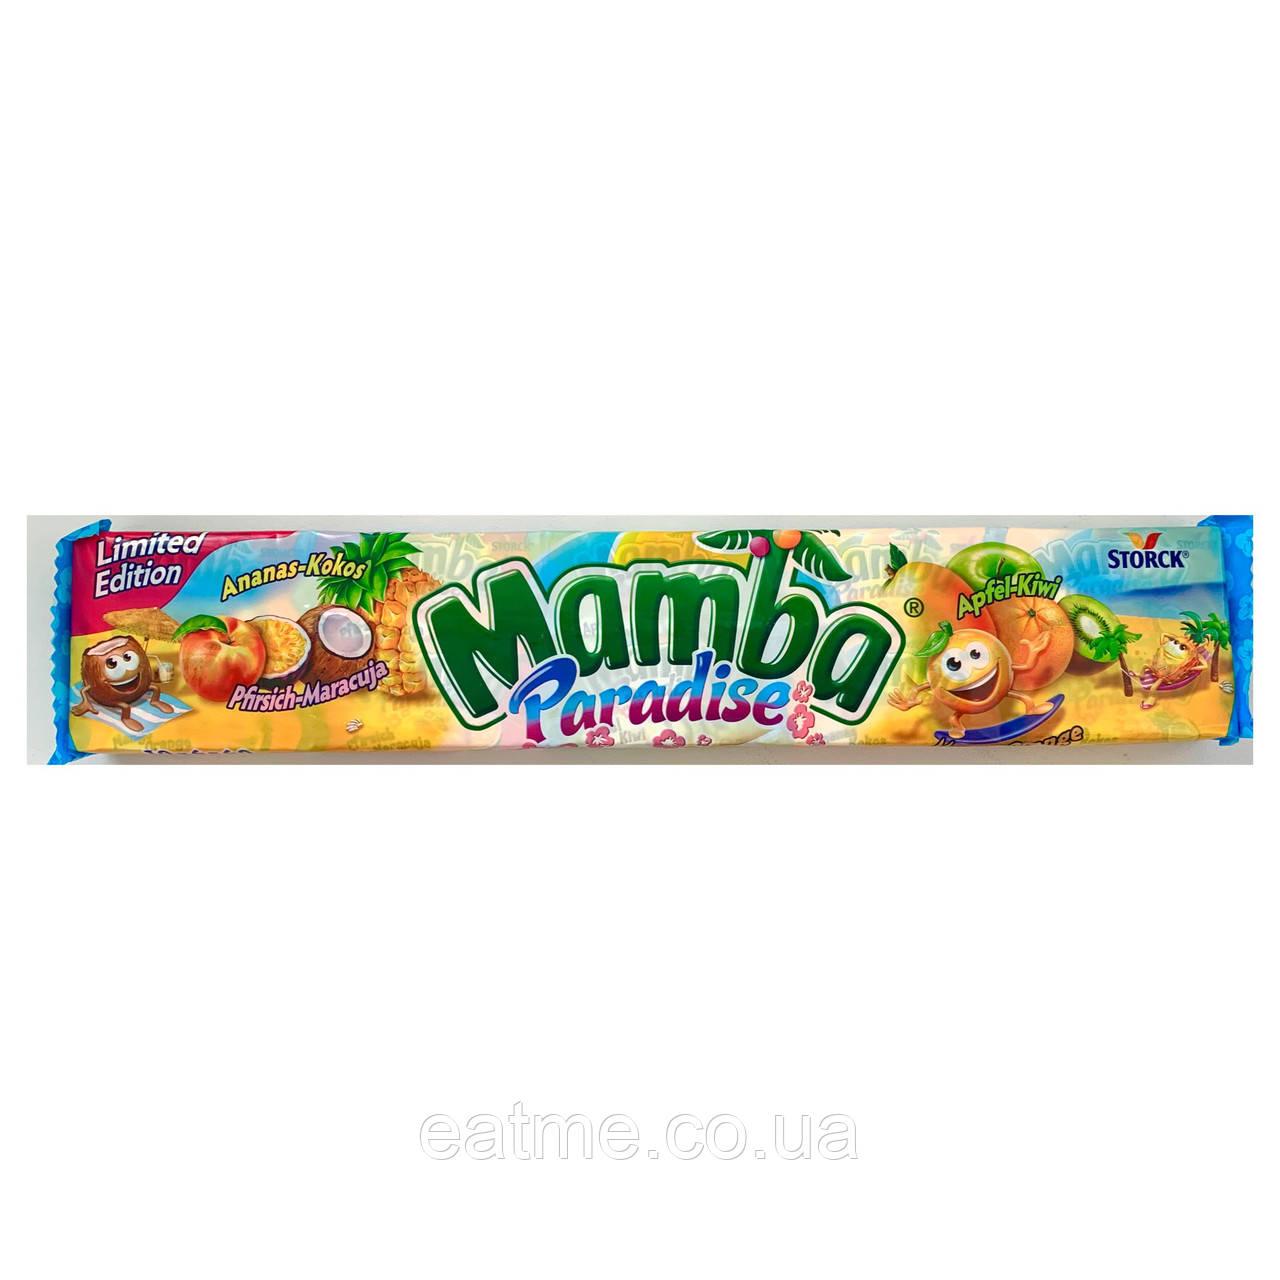 Mamba Paradise (Ананас+кокос, Персик+маракуйя, яблоко+киви)